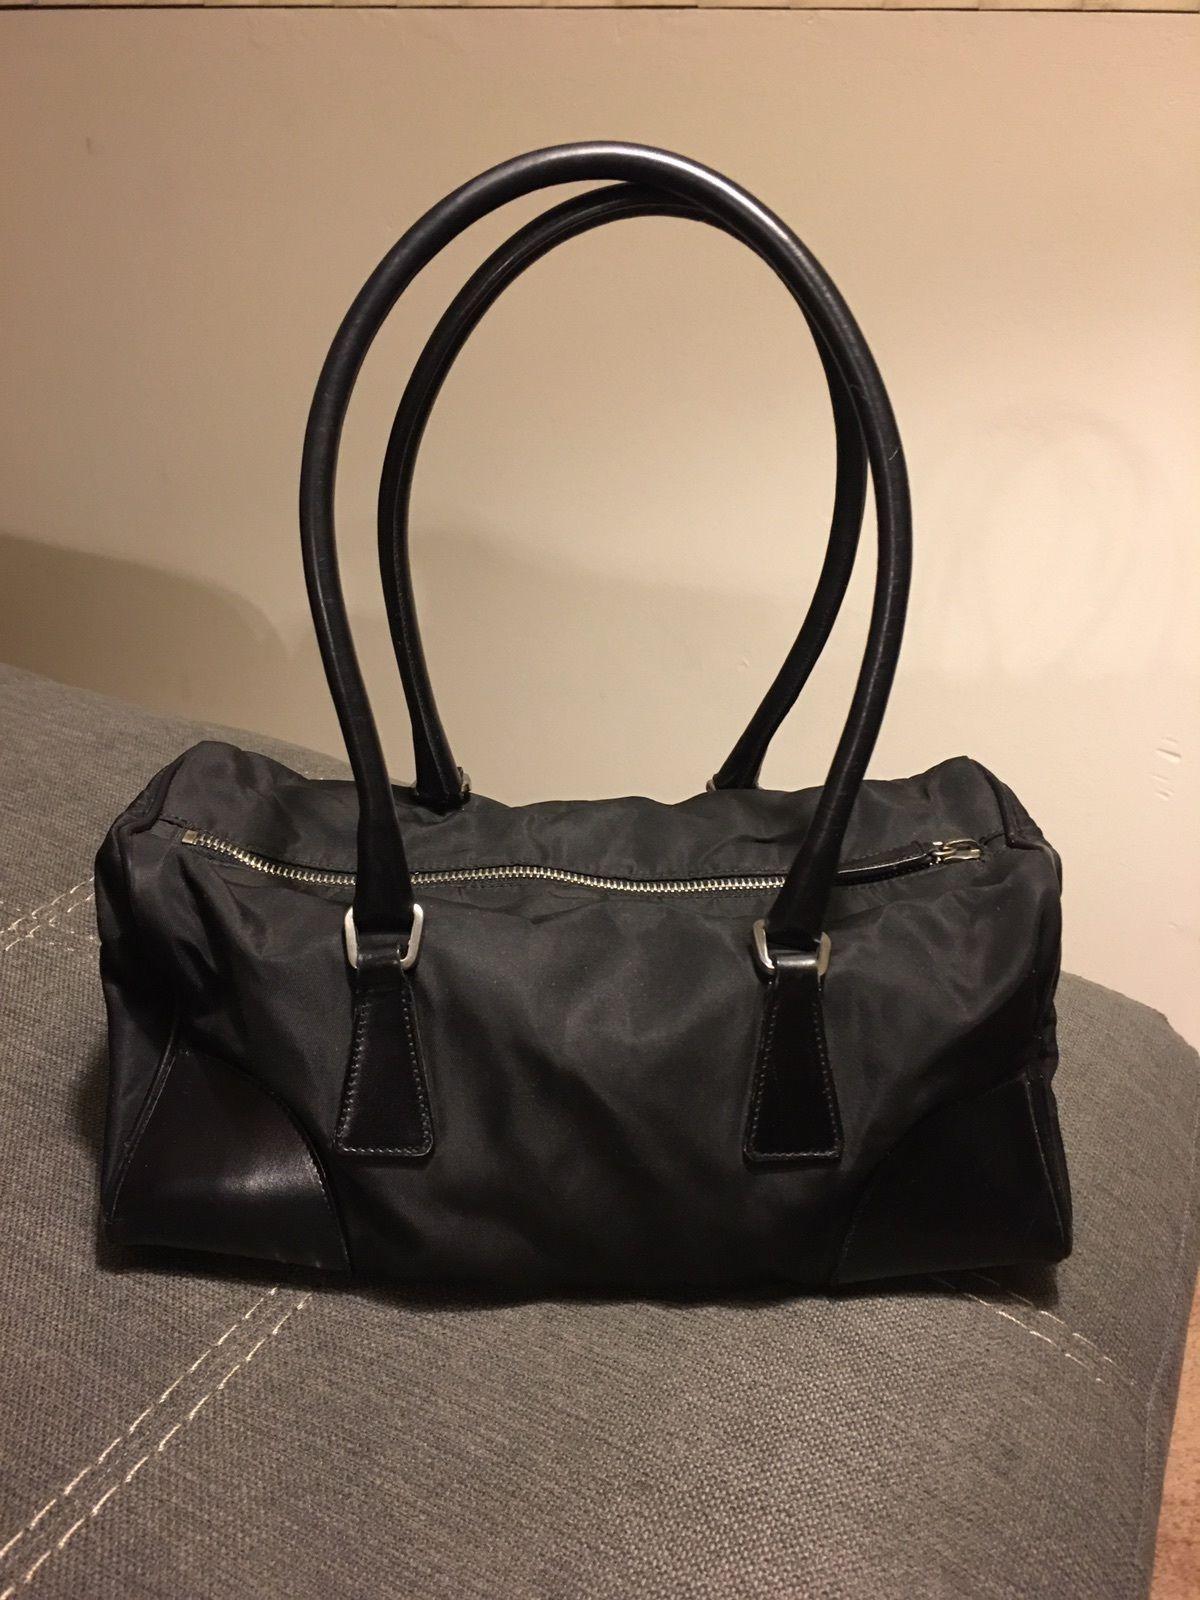 Prada Nylon Bag Vintage 25 0